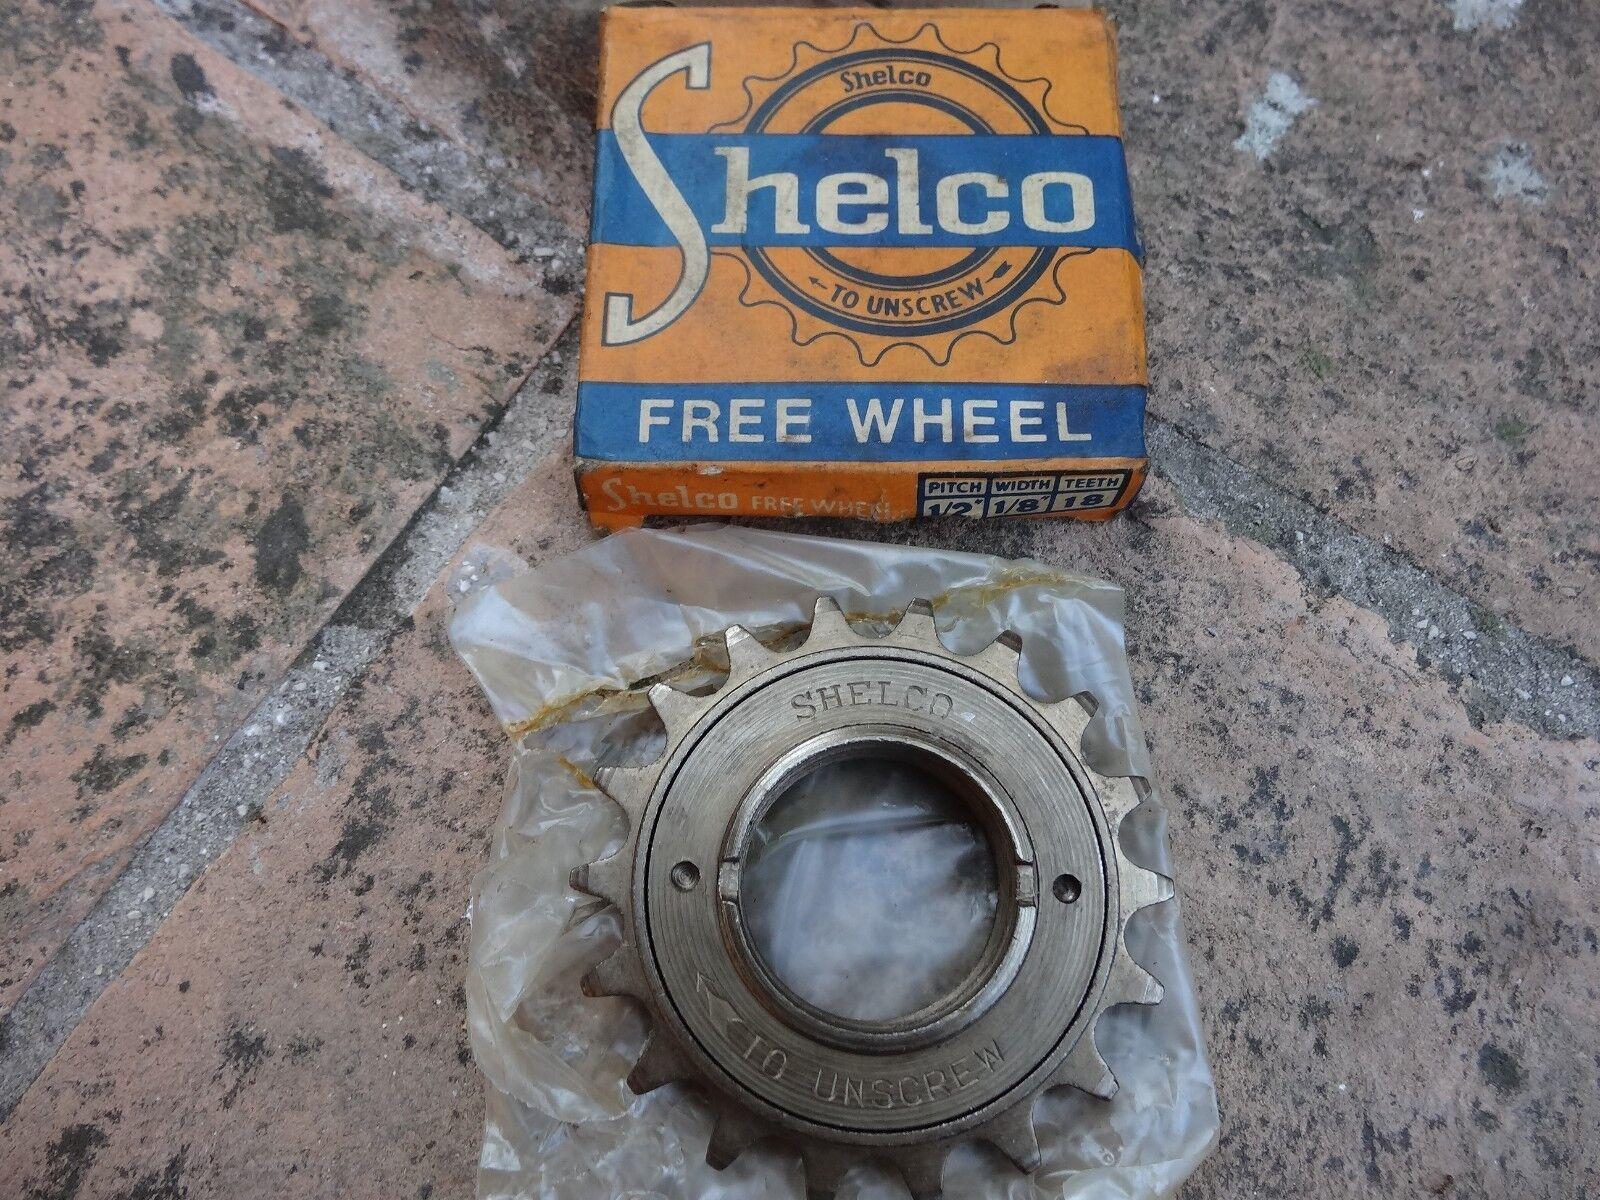 NIB  Shelco free  wheel single speed teeth 18 pitch 1 2  width 1 8   promotions